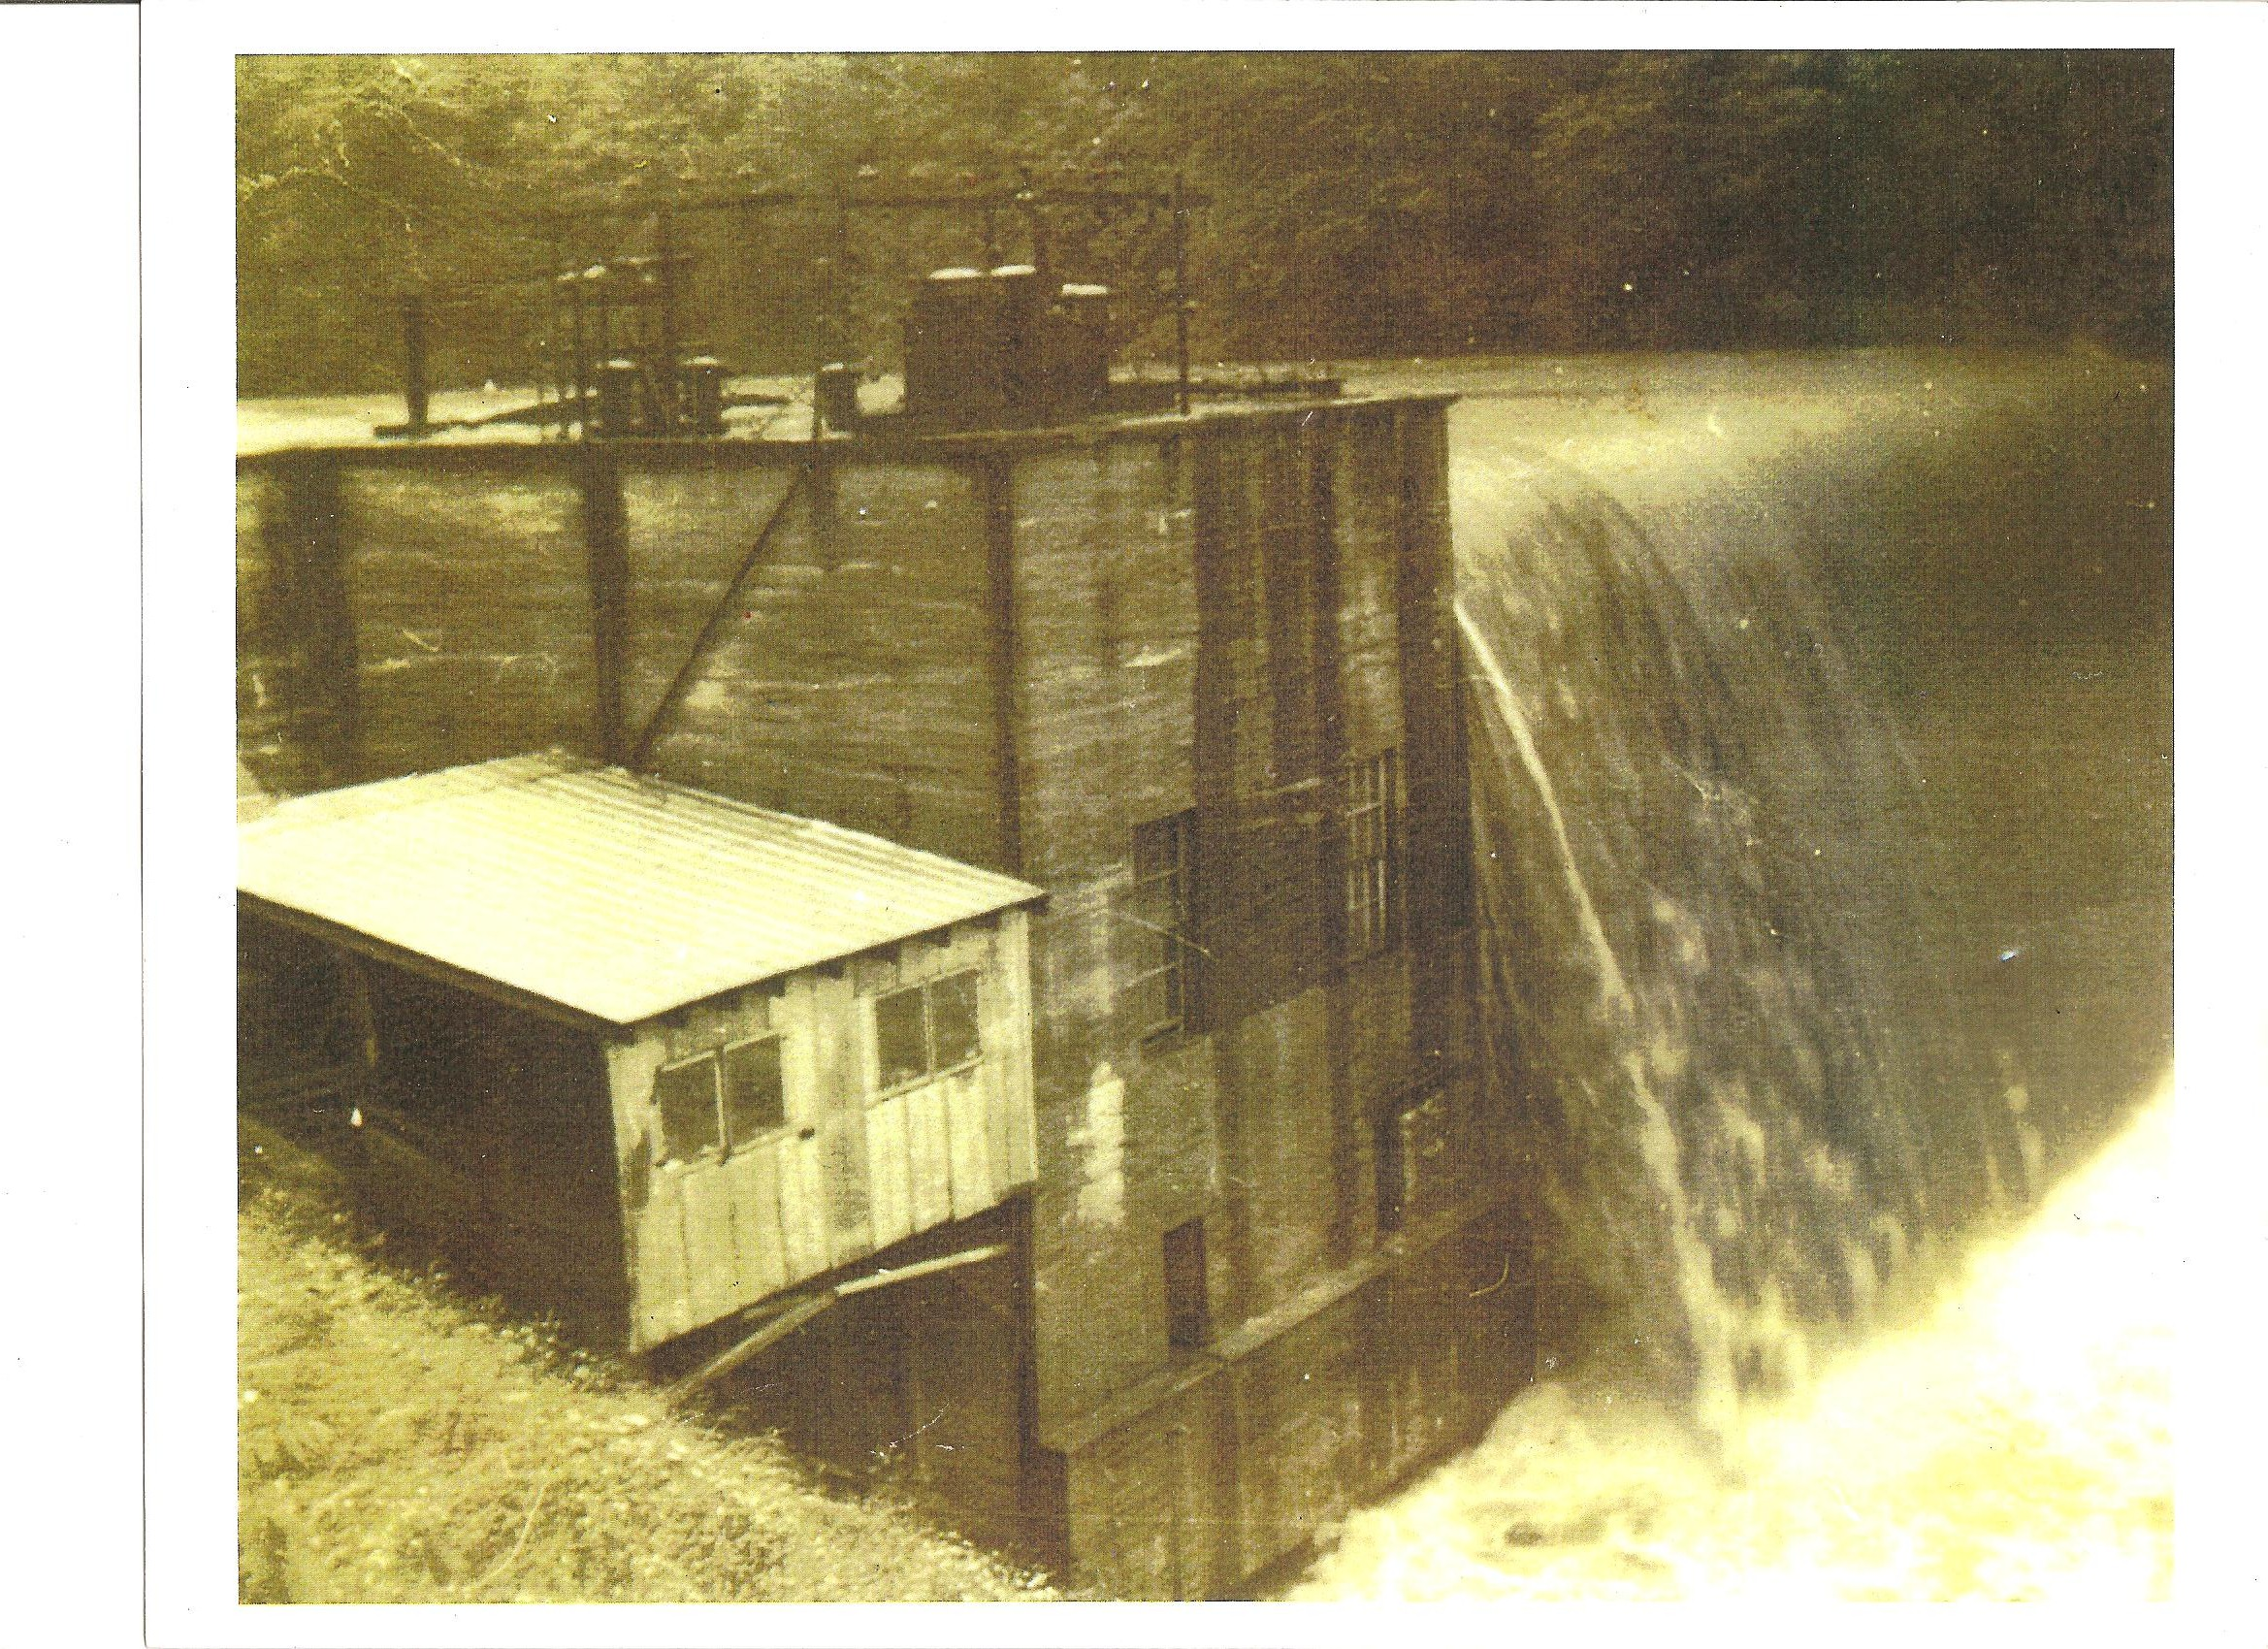 Cane River Dam 001.jpg